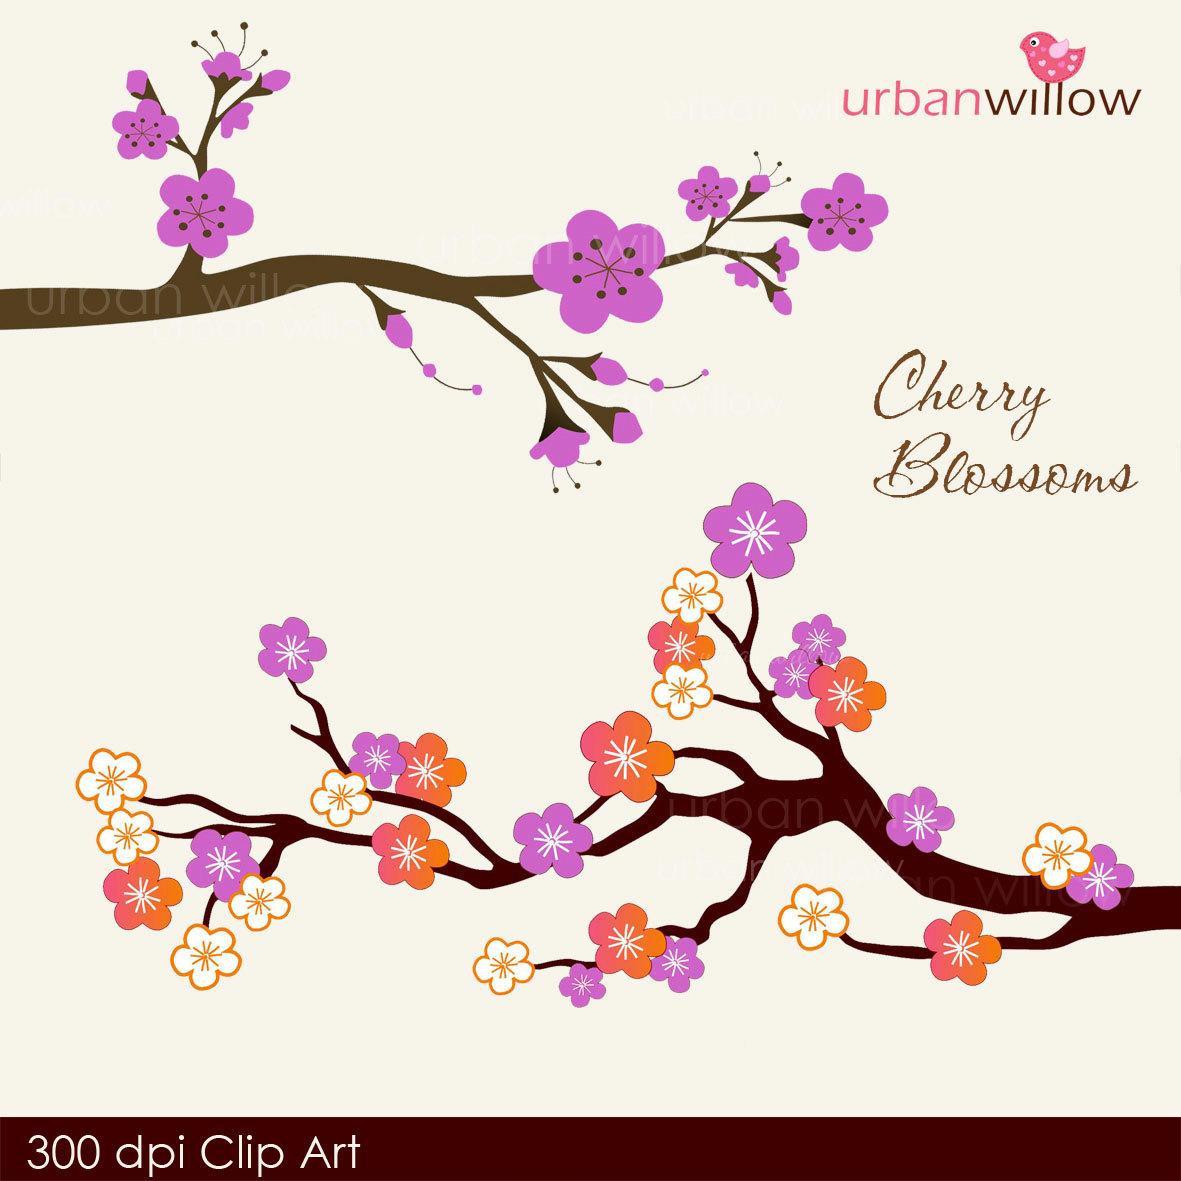 Japanese Cherry Blossom Clip Art - ClipArt Best